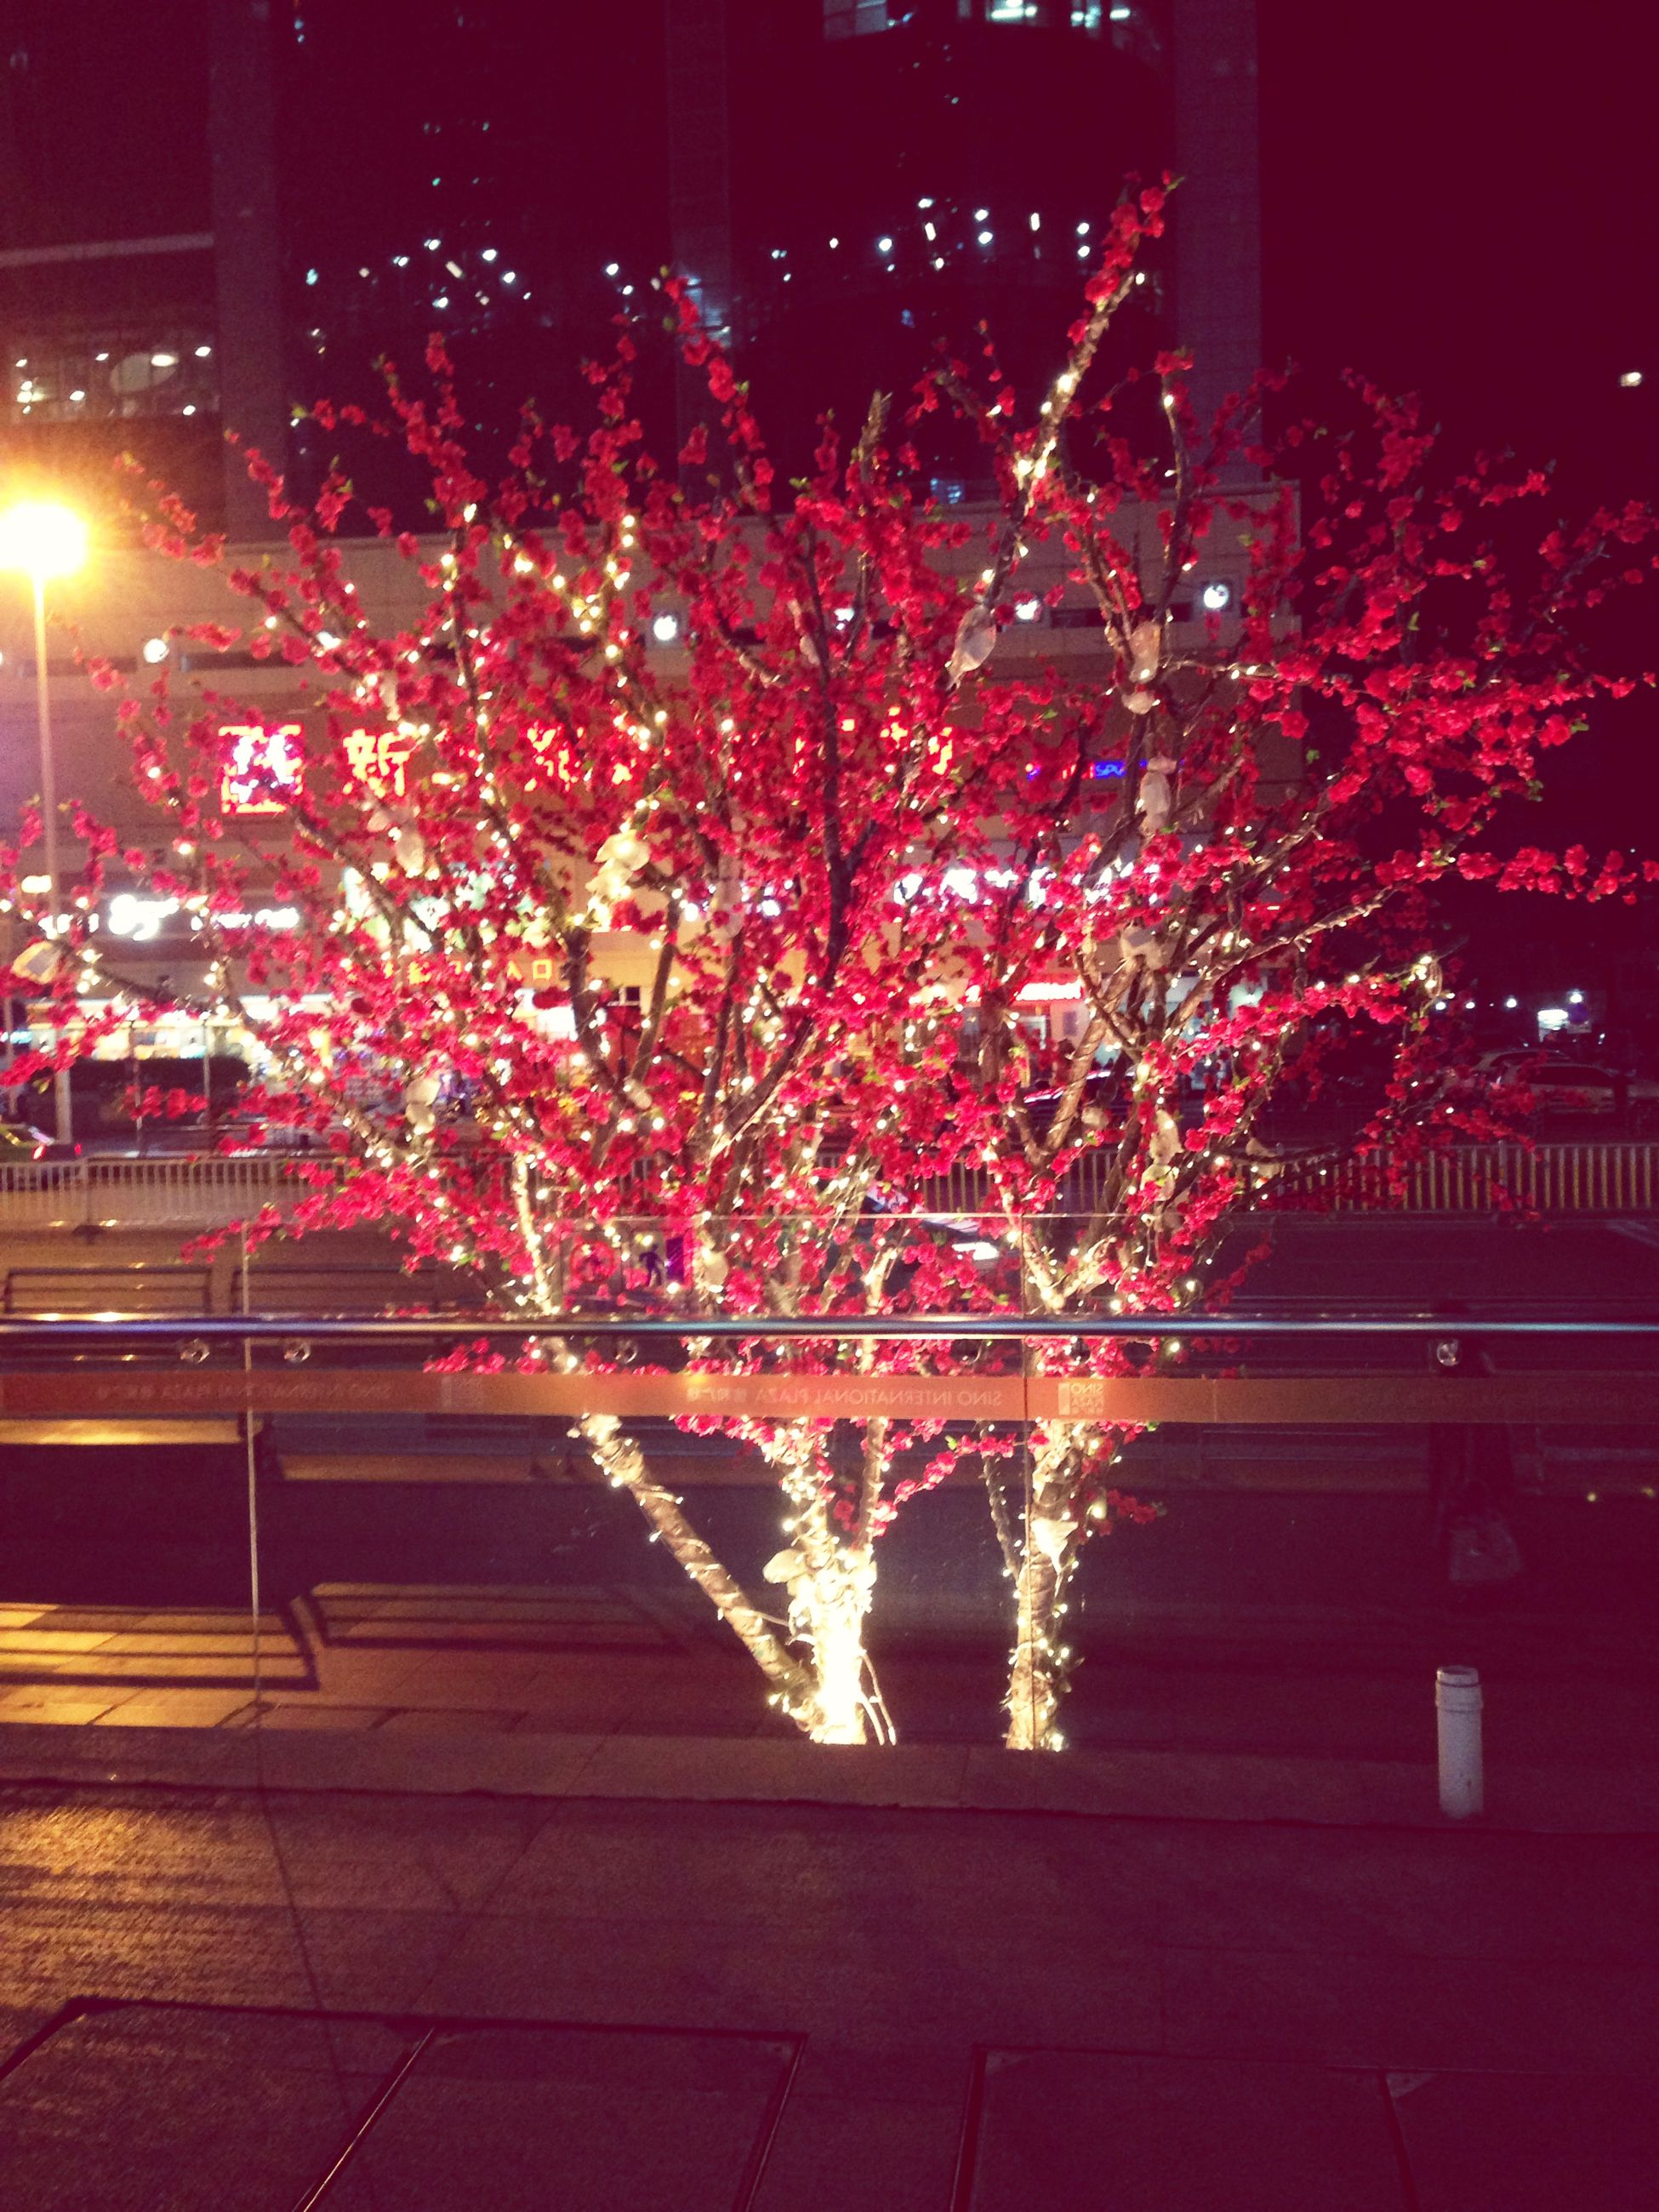 night, illuminated, building exterior, built structure, architecture, lighting equipment, city, street light, railing, tree, street, motion, outdoors, sidewalk, light - natural phenomenon, no people, city life, red, decoration, glowing